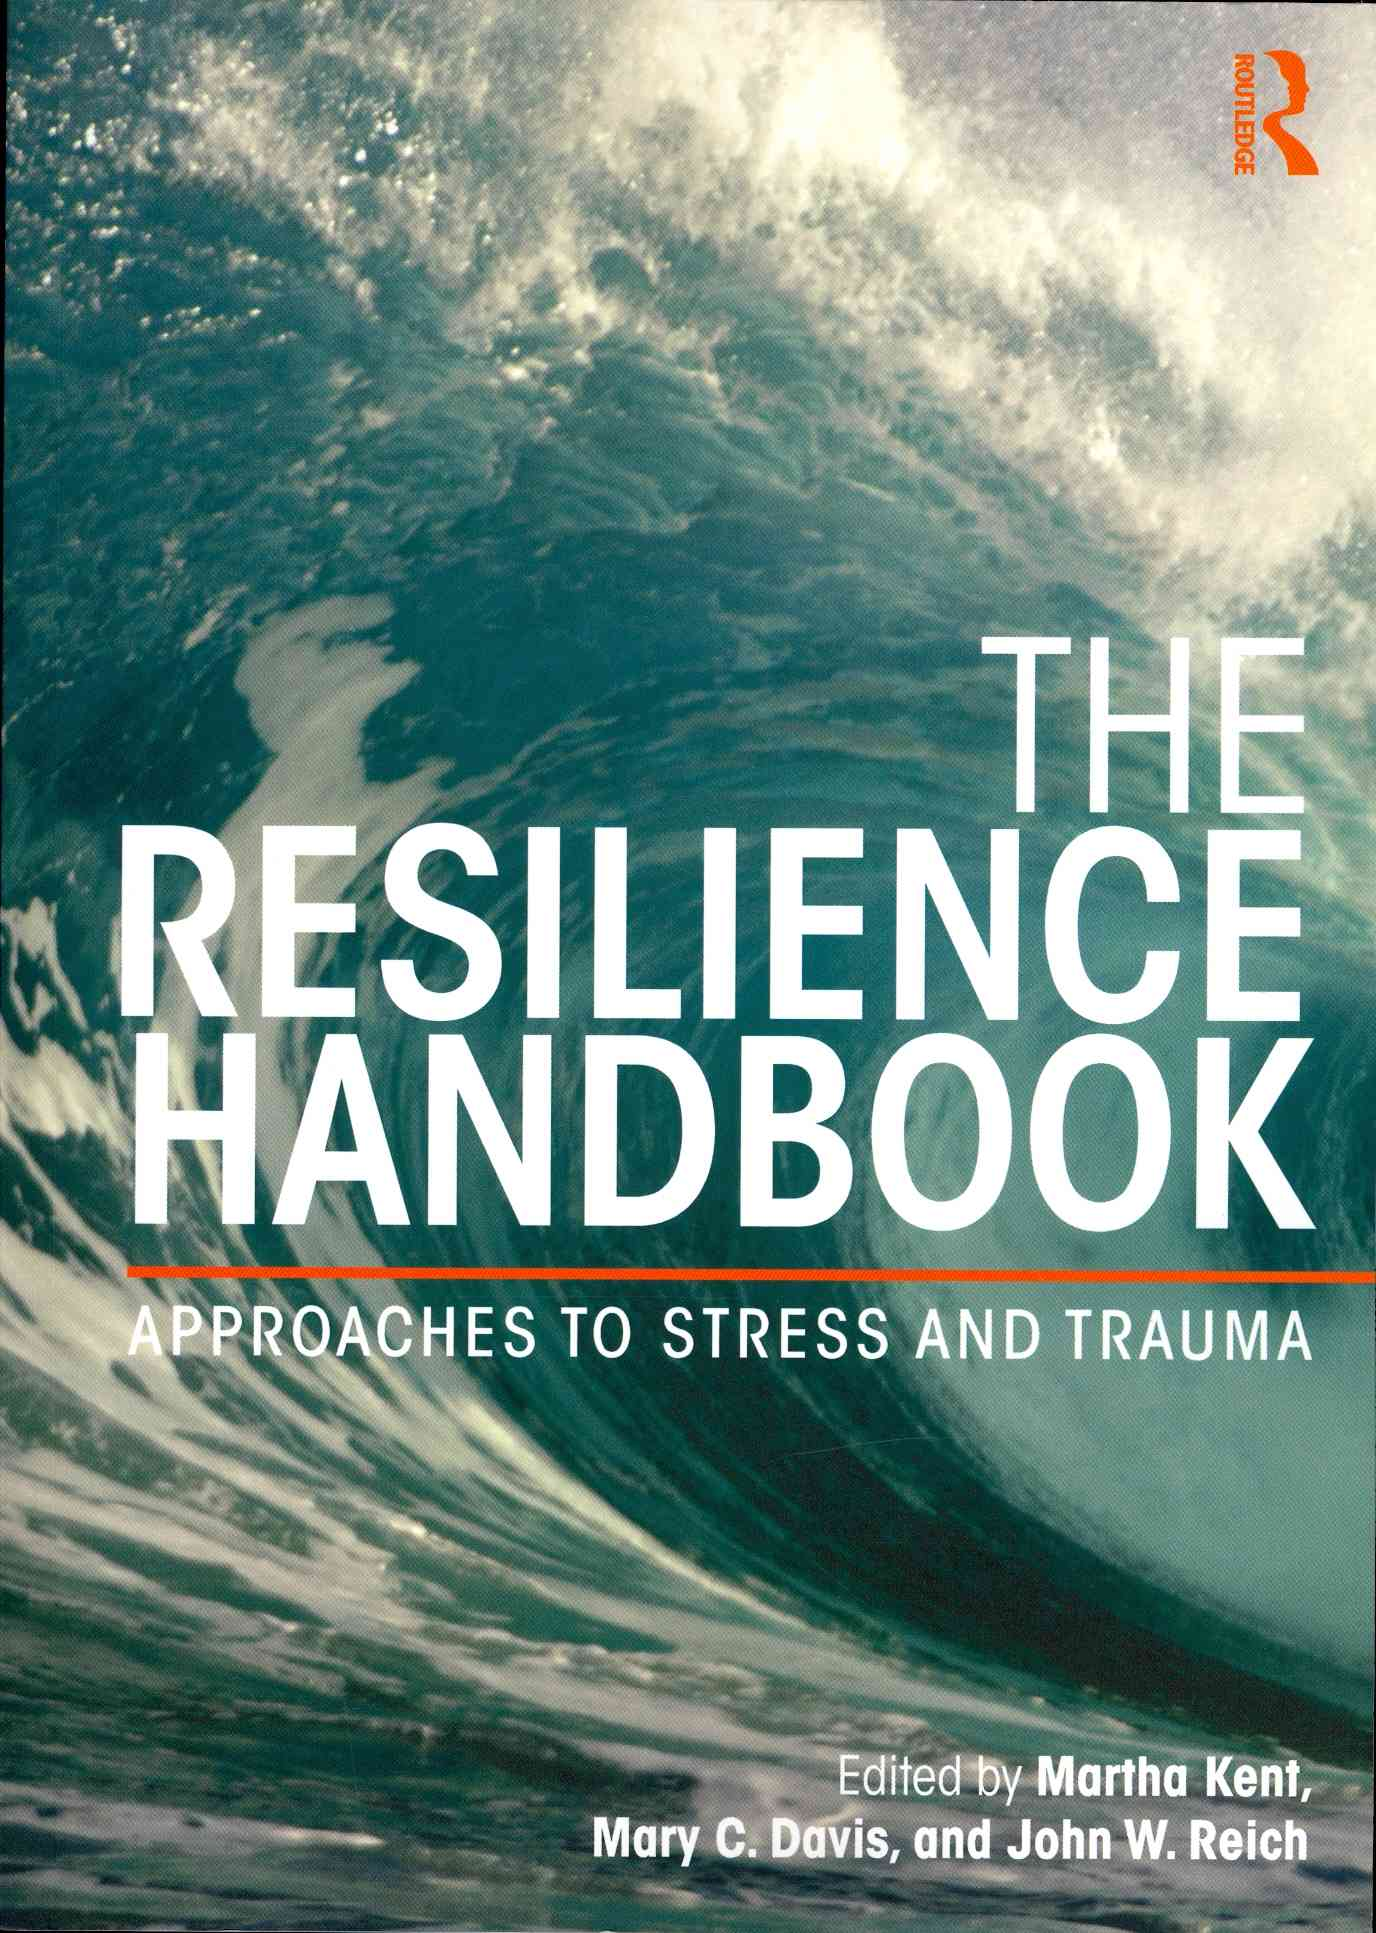 The Resilience Handbook By Kent, Martha (EDT)/ Davis, Mary C. (EDT)/ Reich, John W. (EDT)